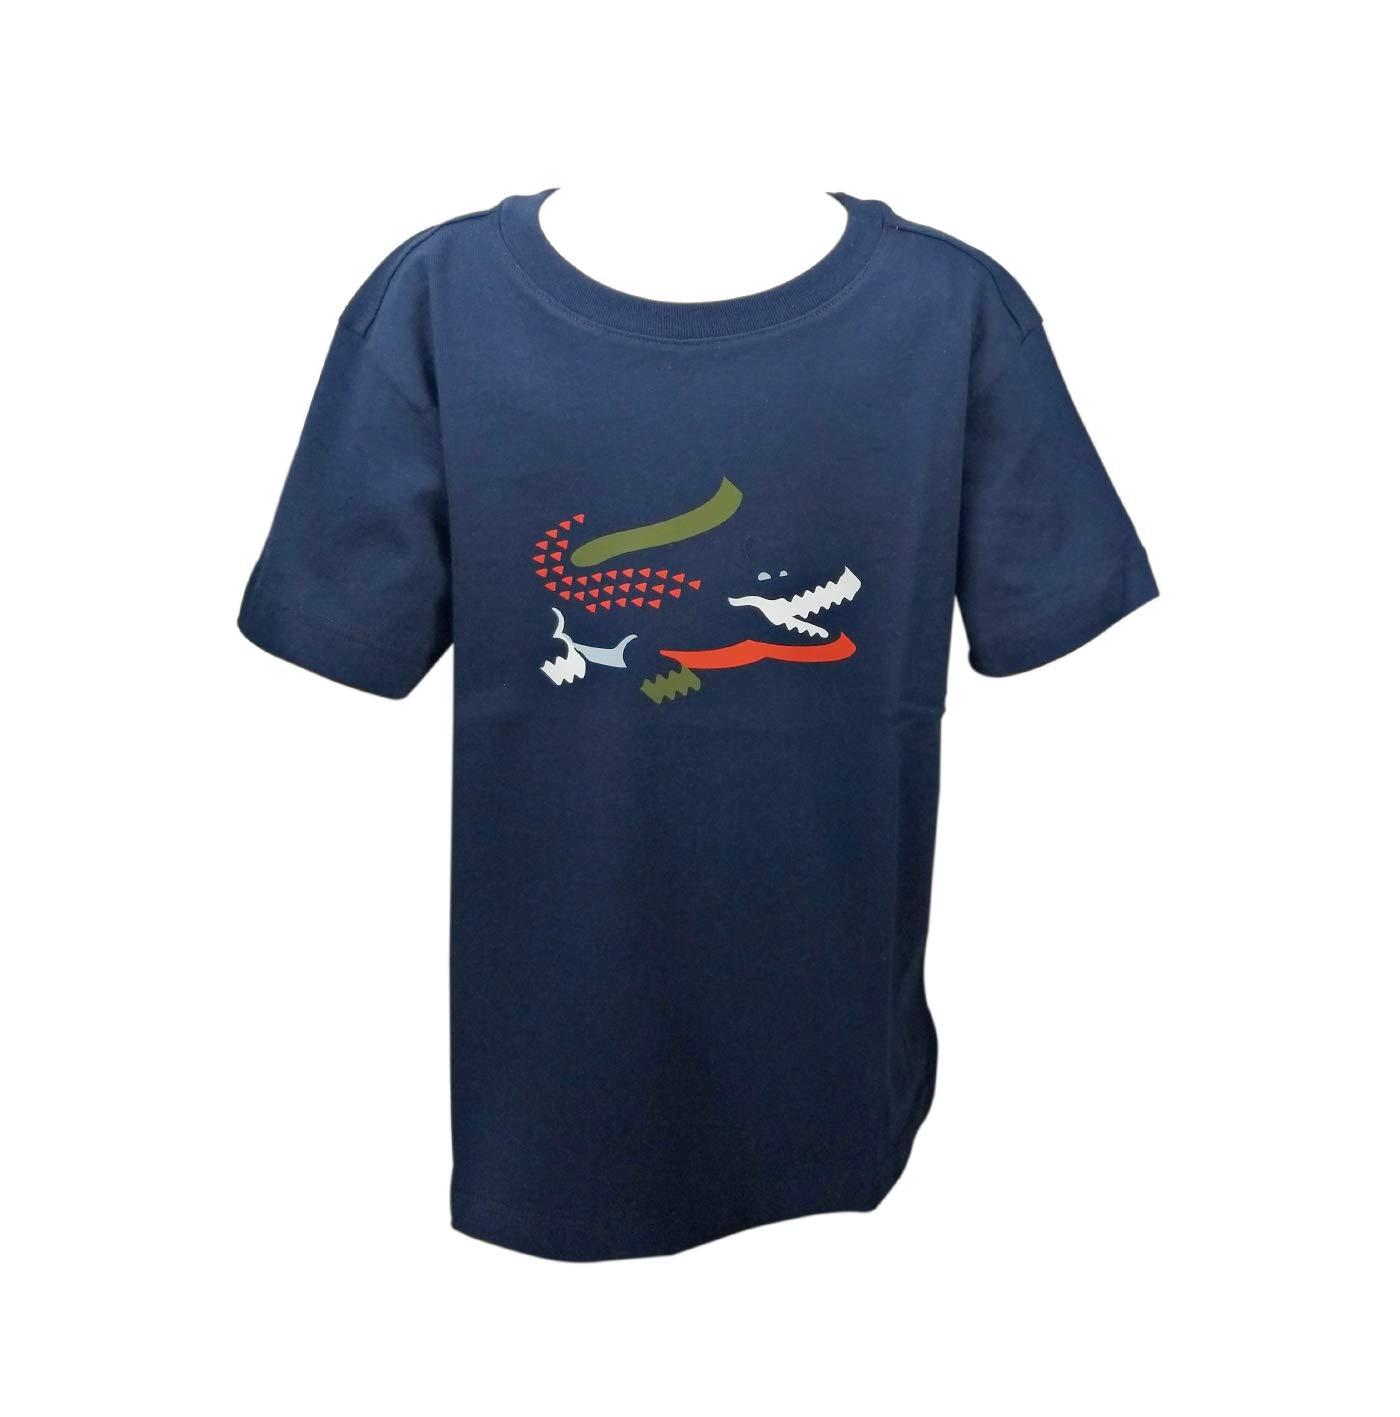 Lacoste Big BOY Multico Graphic Croc T-Shirt, Navy Blue 8YR